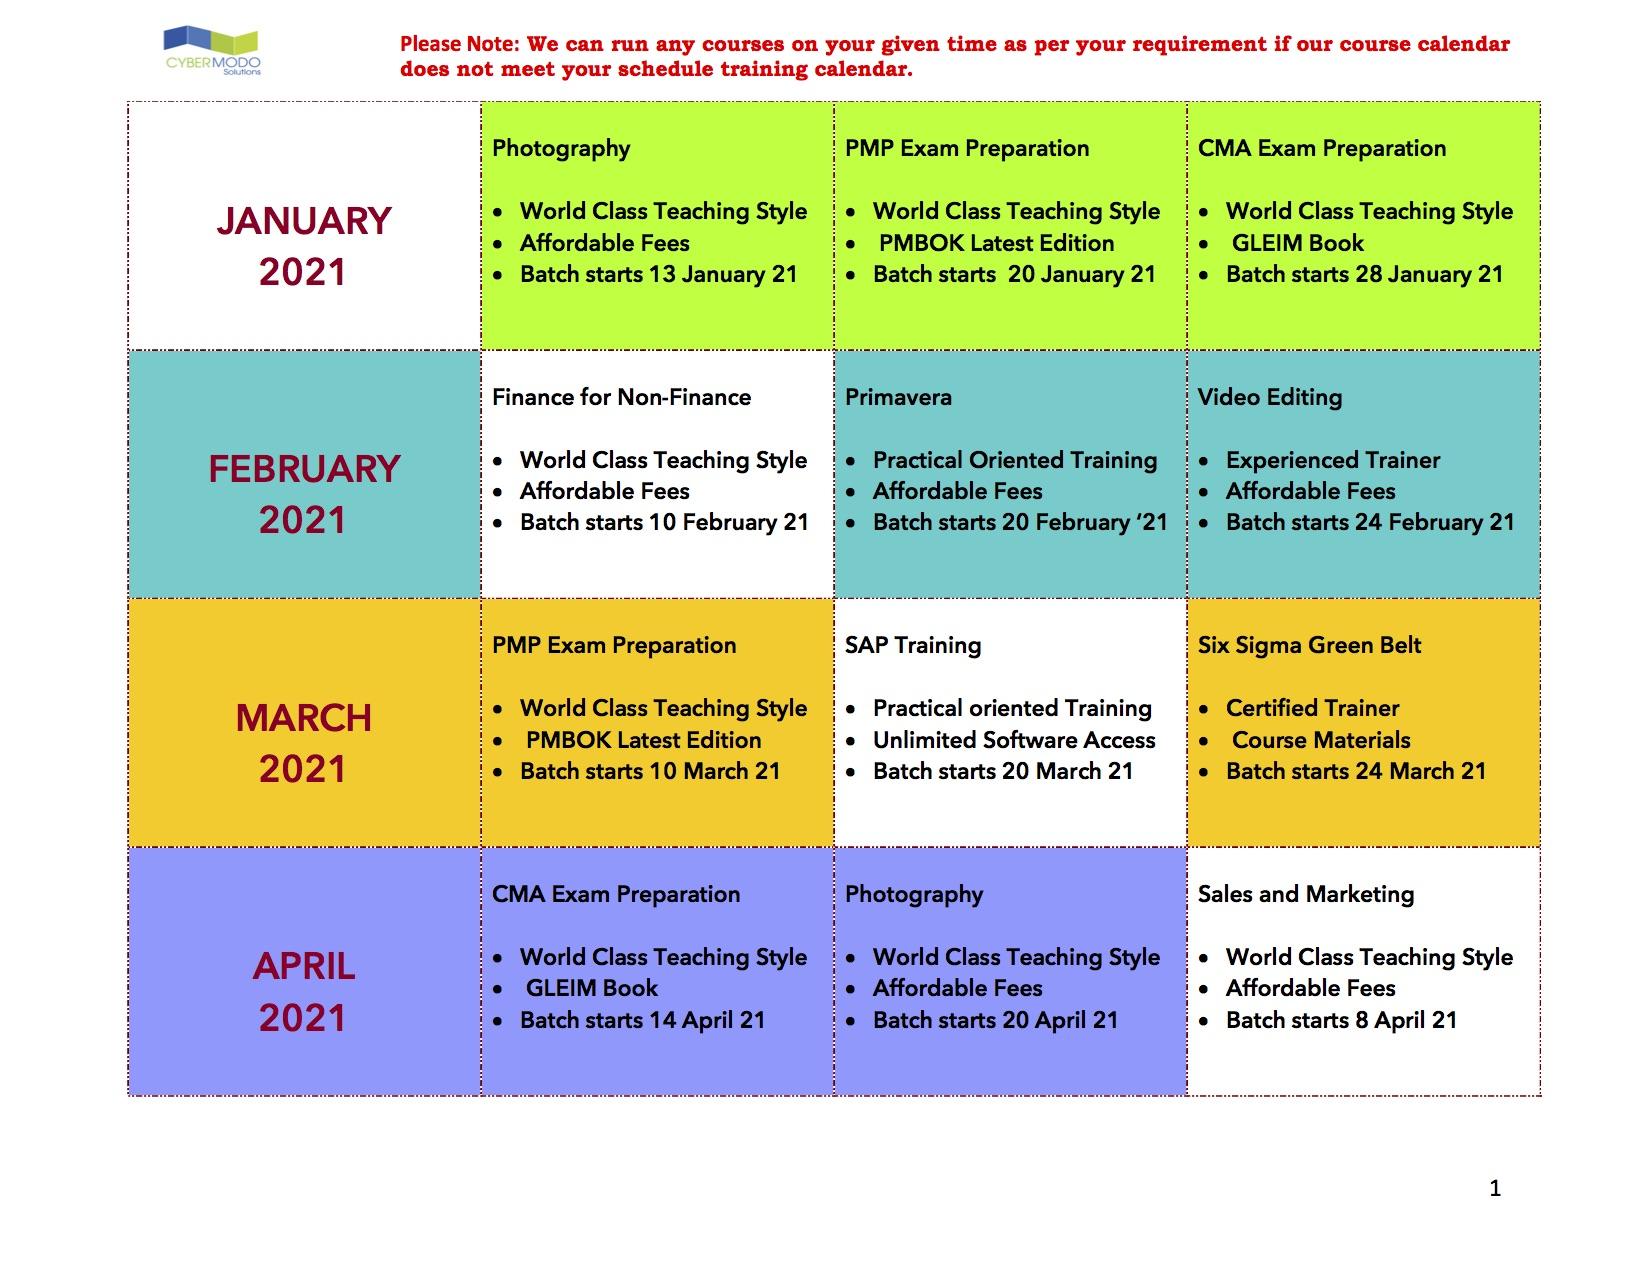 training calendar Jan - Apr 2021